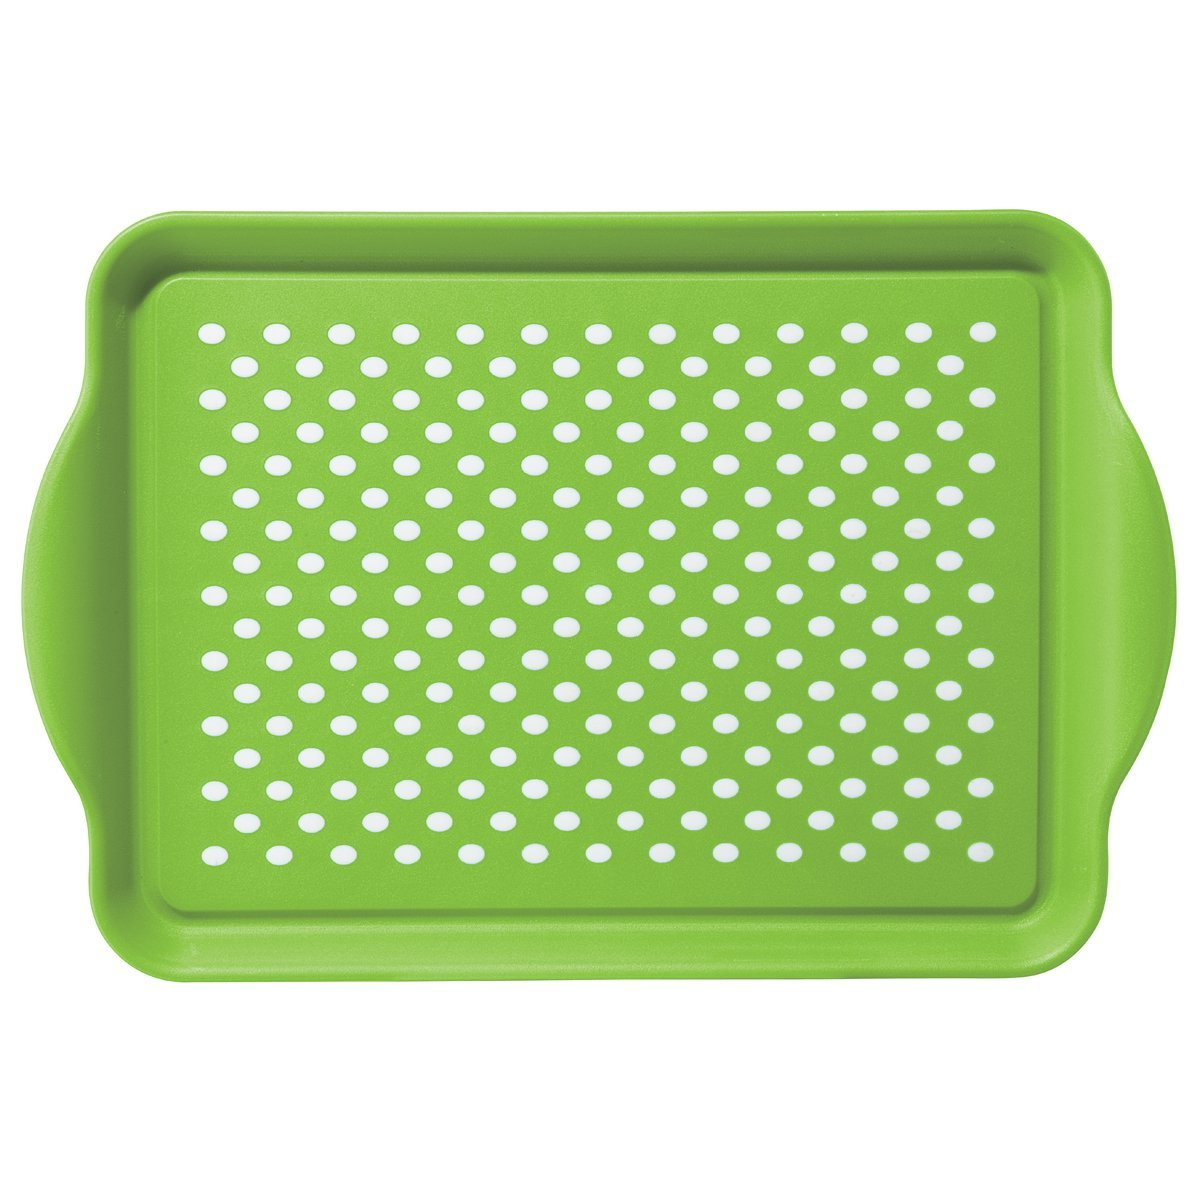 Oggi Rubbergrip Green Non-Skid Rectangular Serving Tray